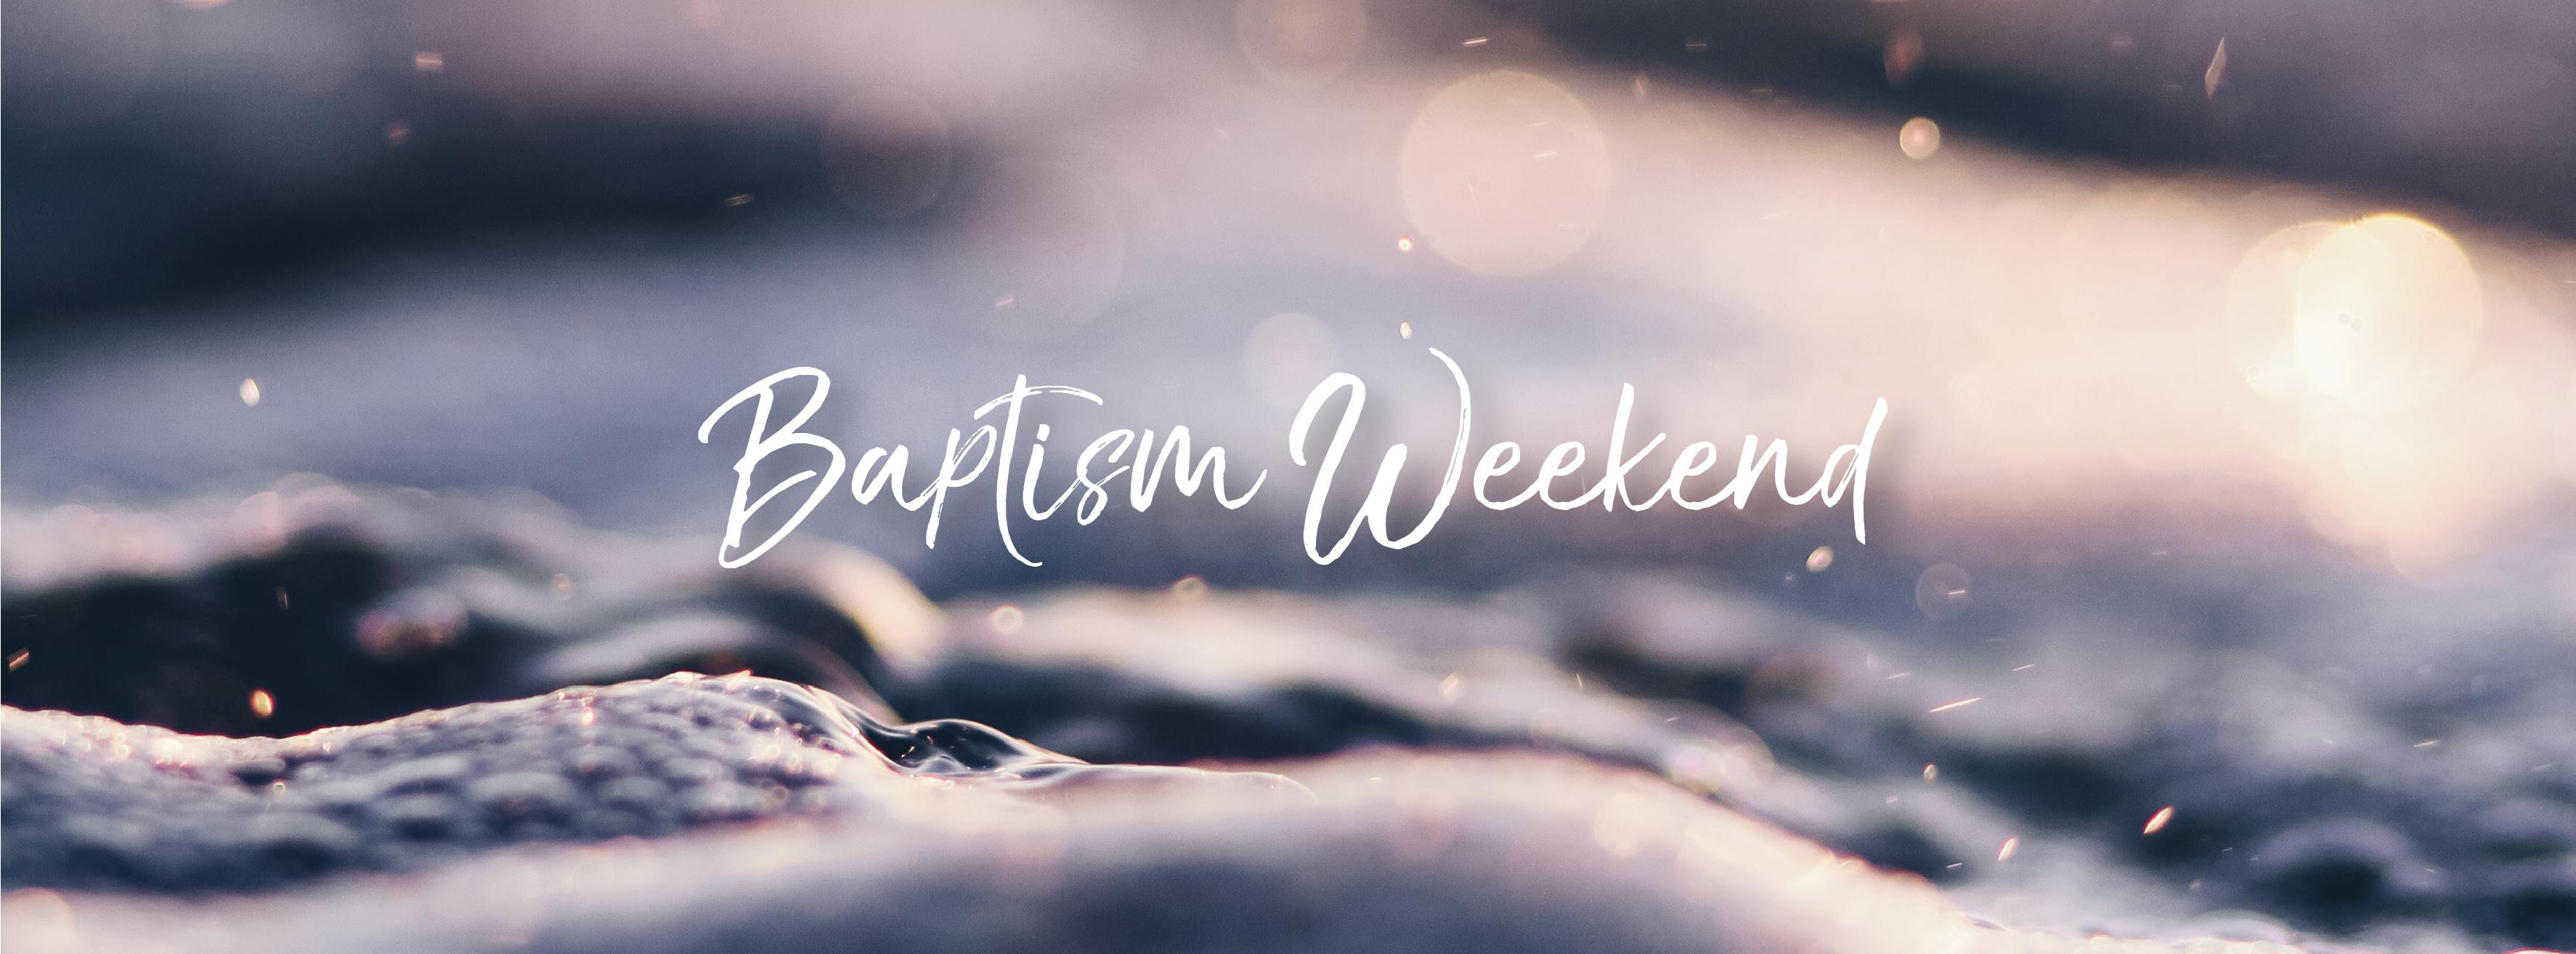 Baptismjanuary2018 06